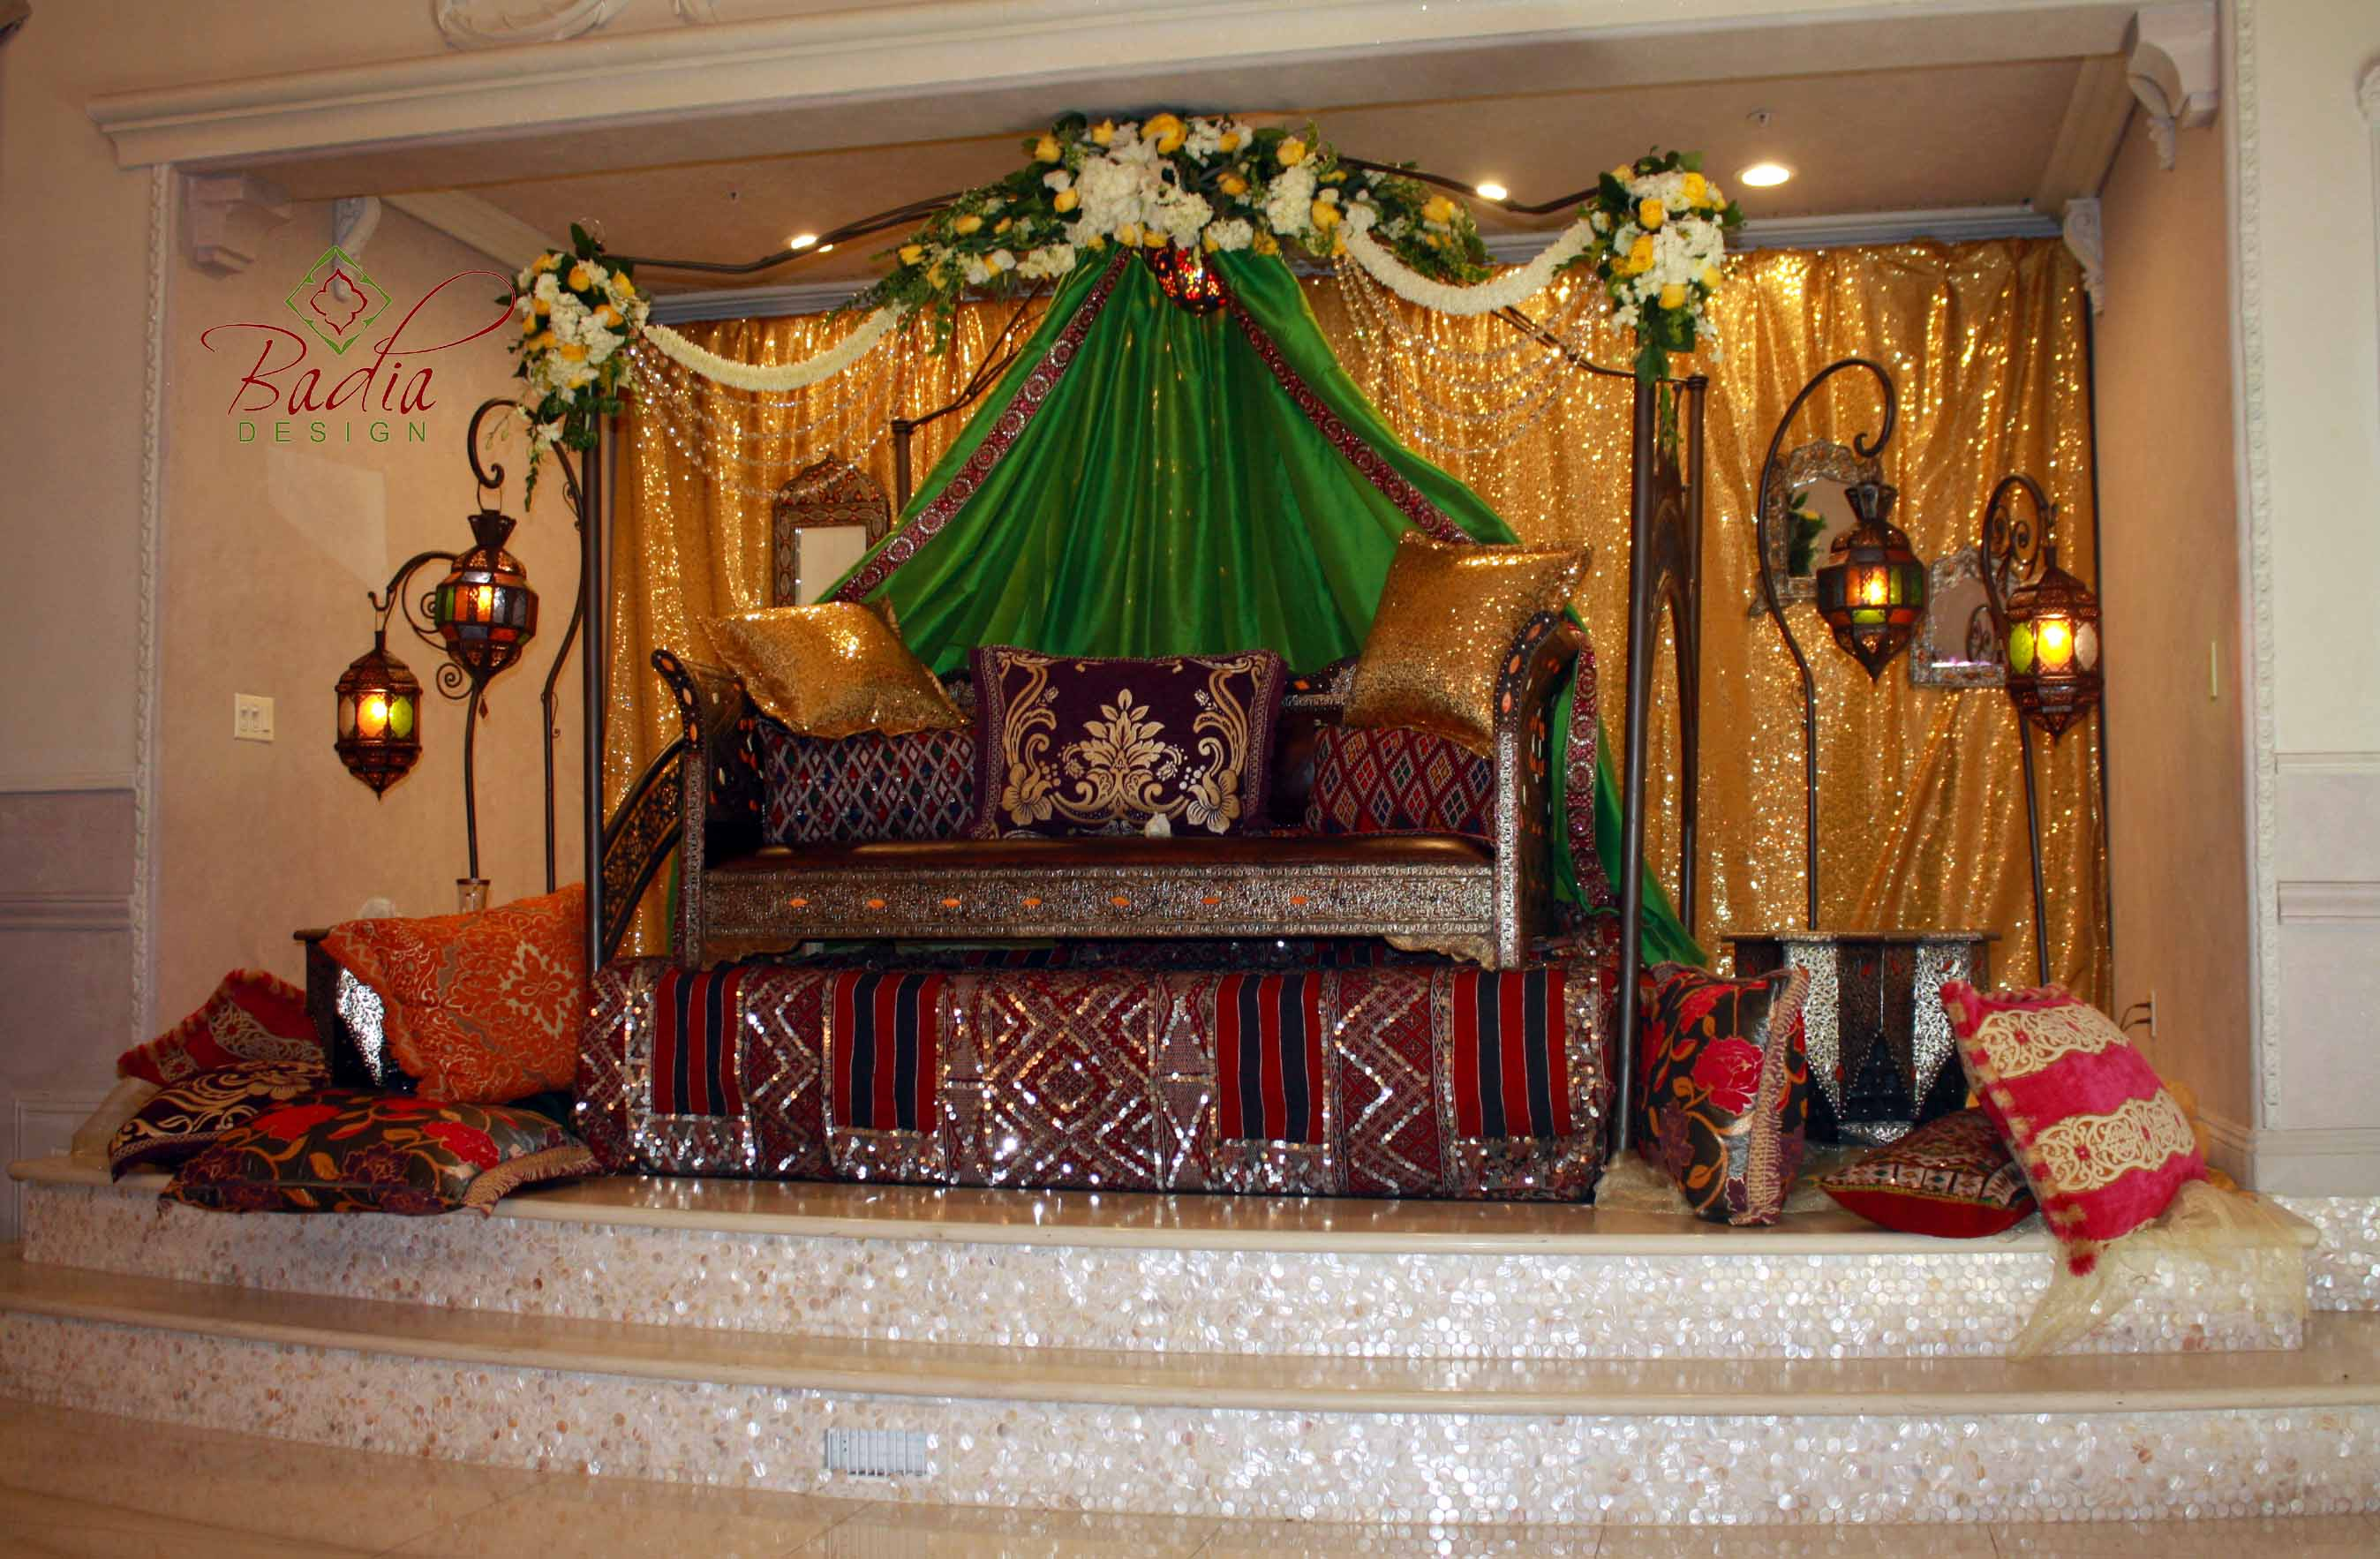 Moroccan Wedding Design from Badia Design Inc.